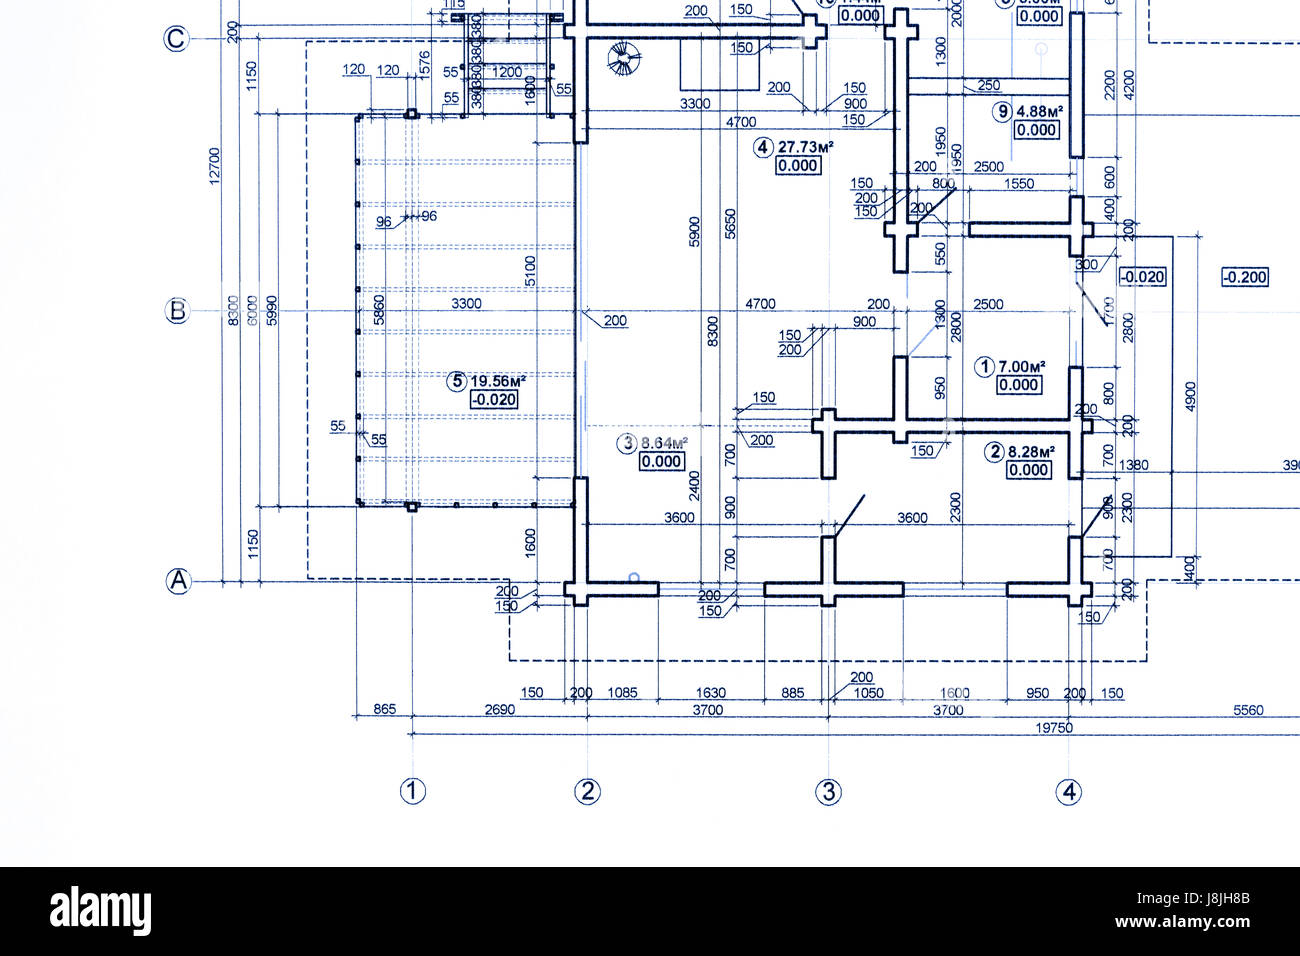 Part of blueprint floor plan technical drawing background stock part of blueprint floor plan technical drawing background malvernweather Image collections